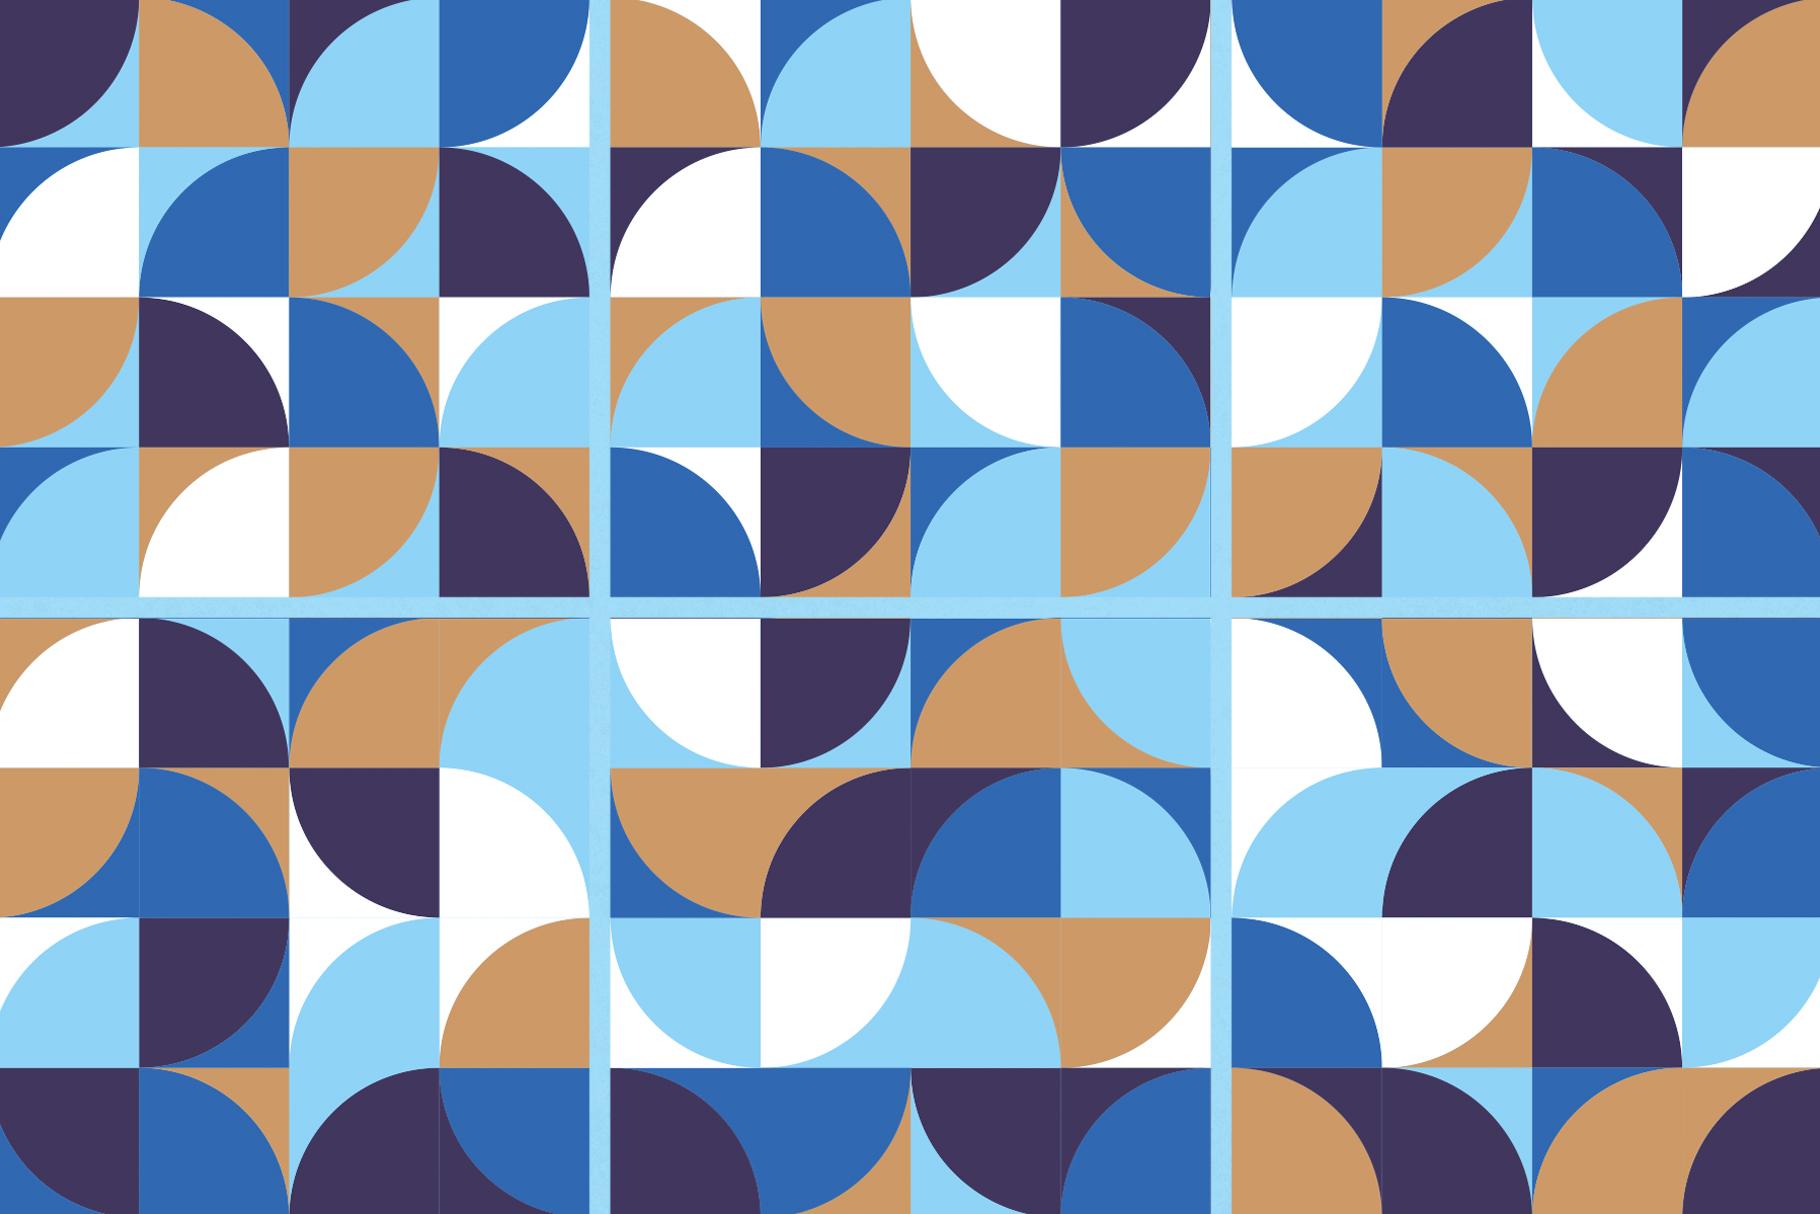 Geometric Shapes Patterns example image 5